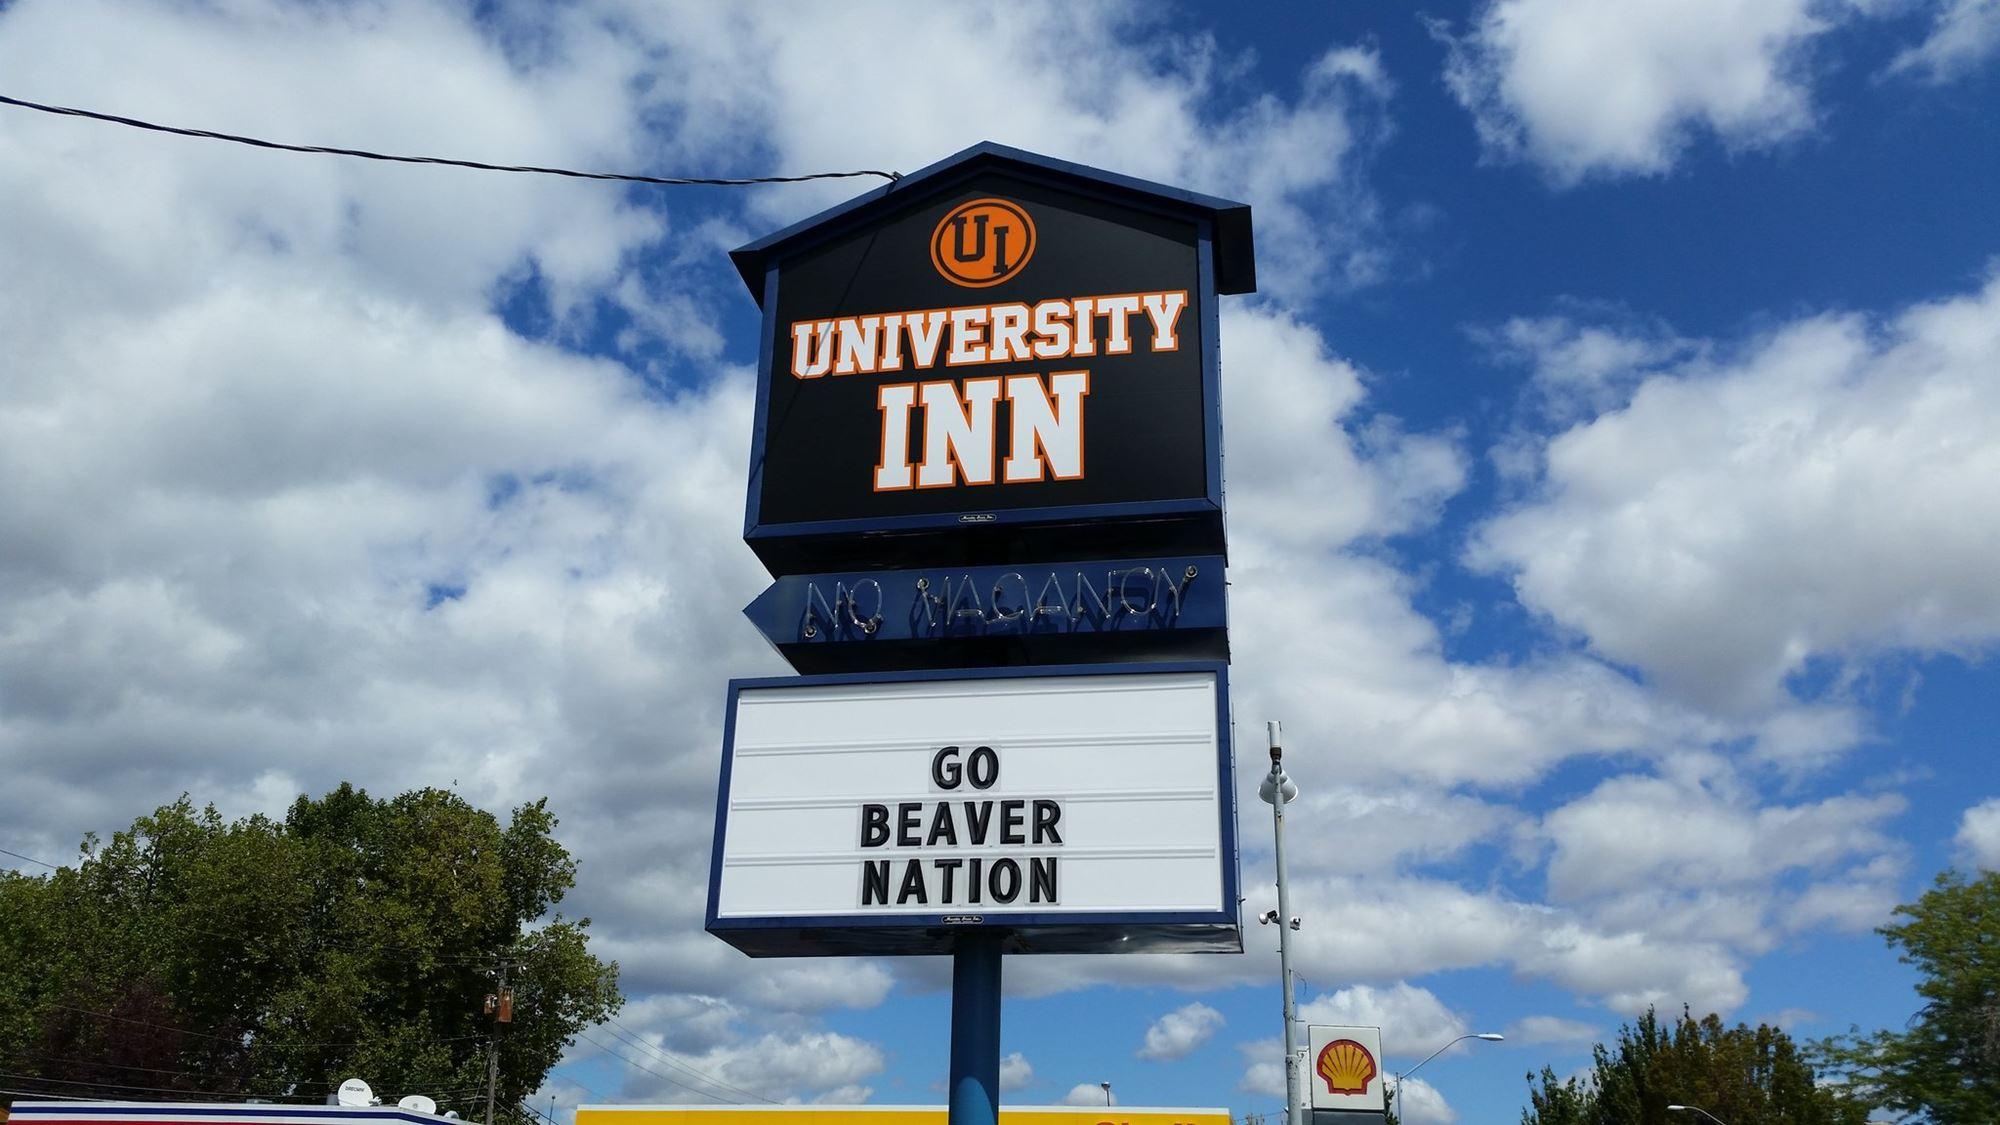 University Inn, Corvallis sign